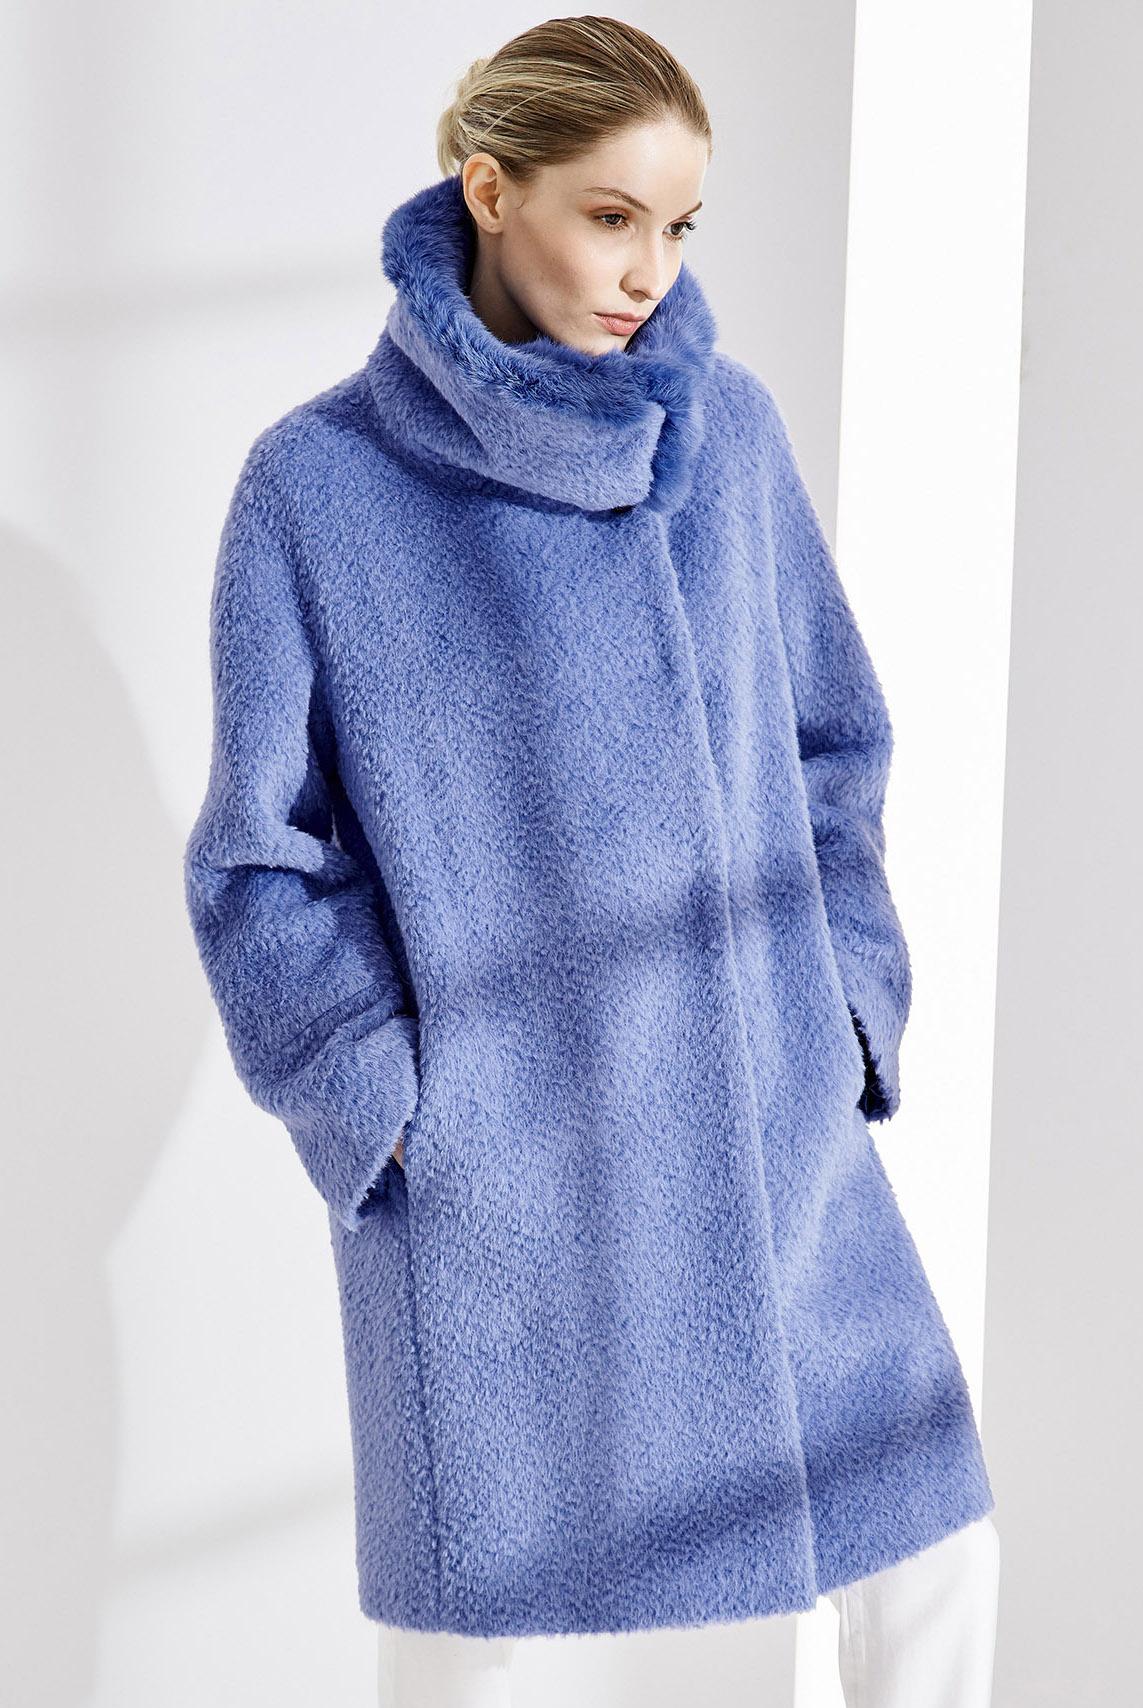 COAT ALESSANDRA AT-308   Colors: winter white, blue, black  Sizes: XS, S, M, L, XL